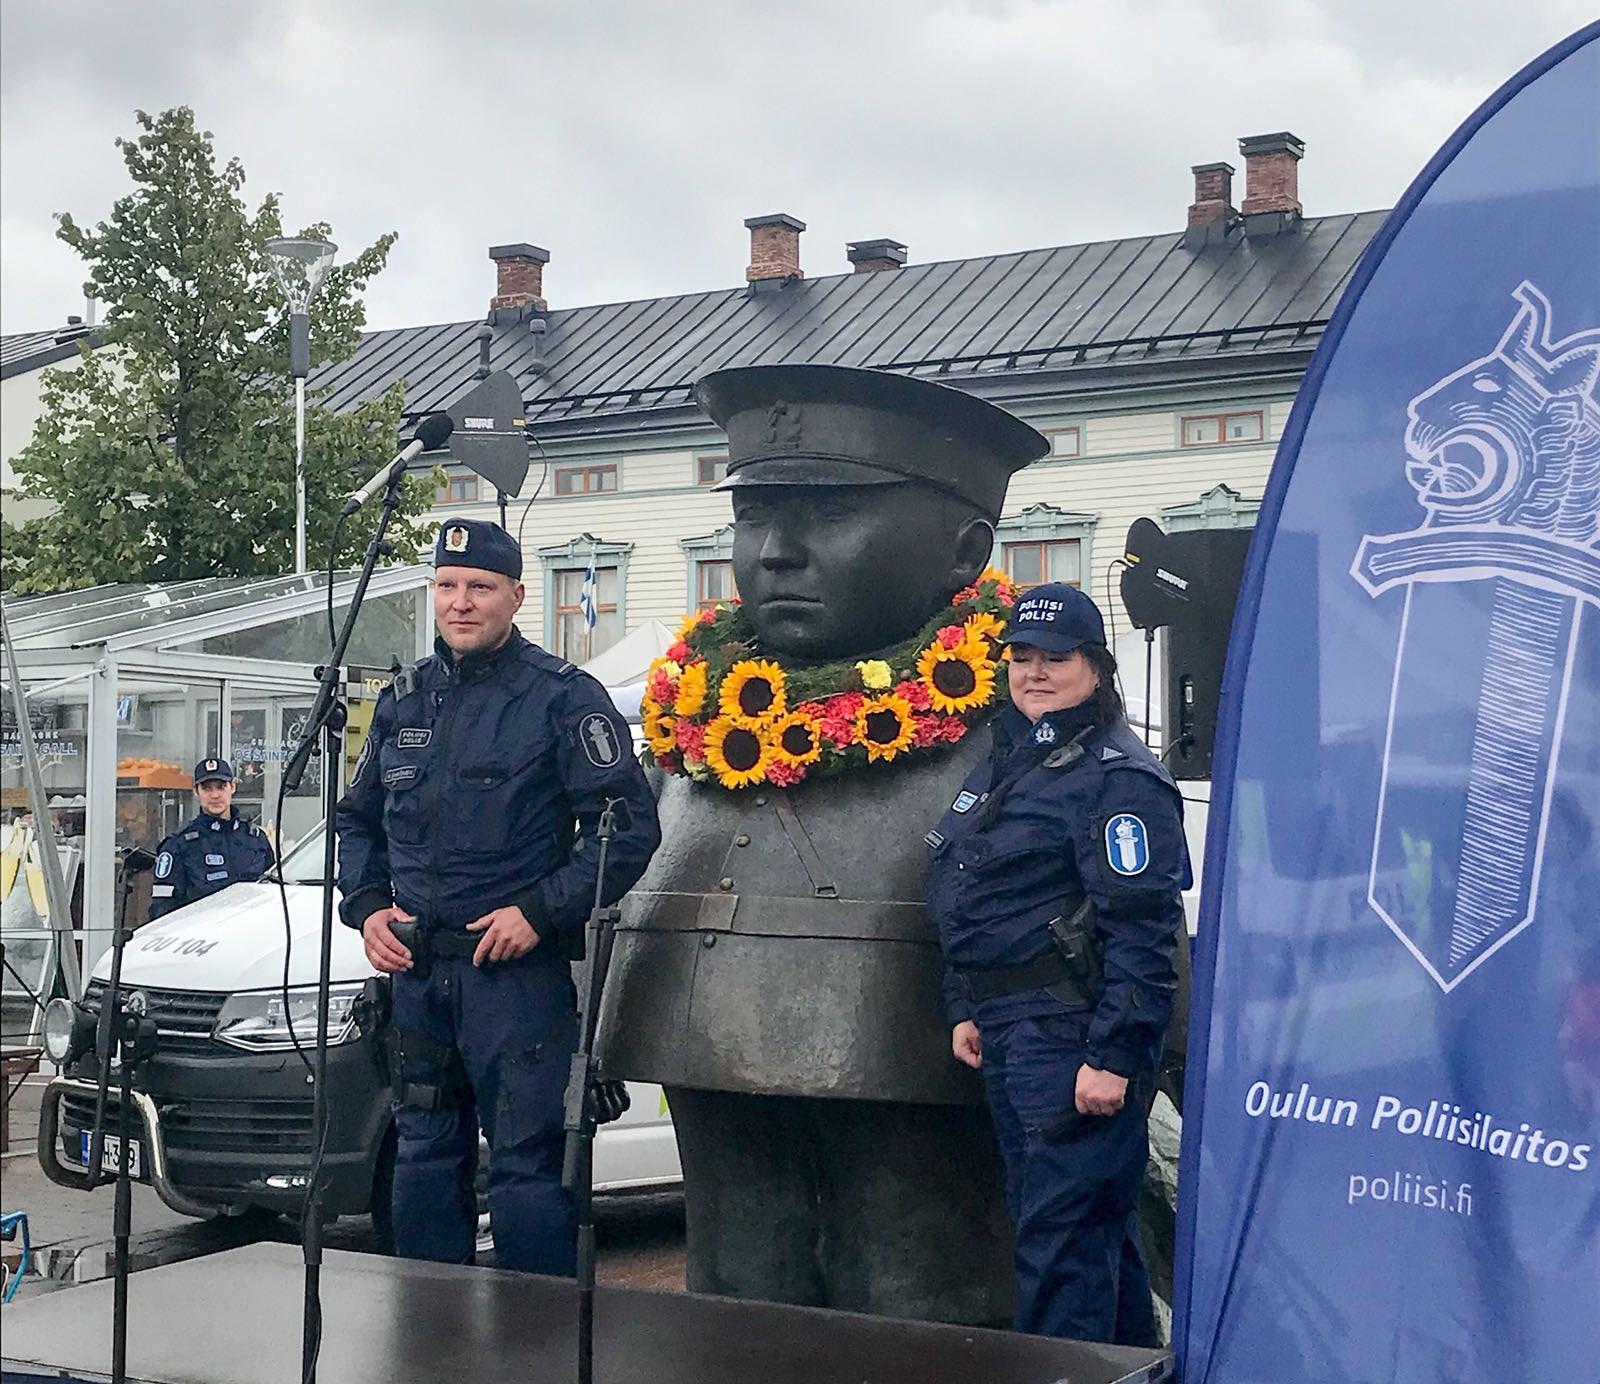 Oulun Poliisiasema